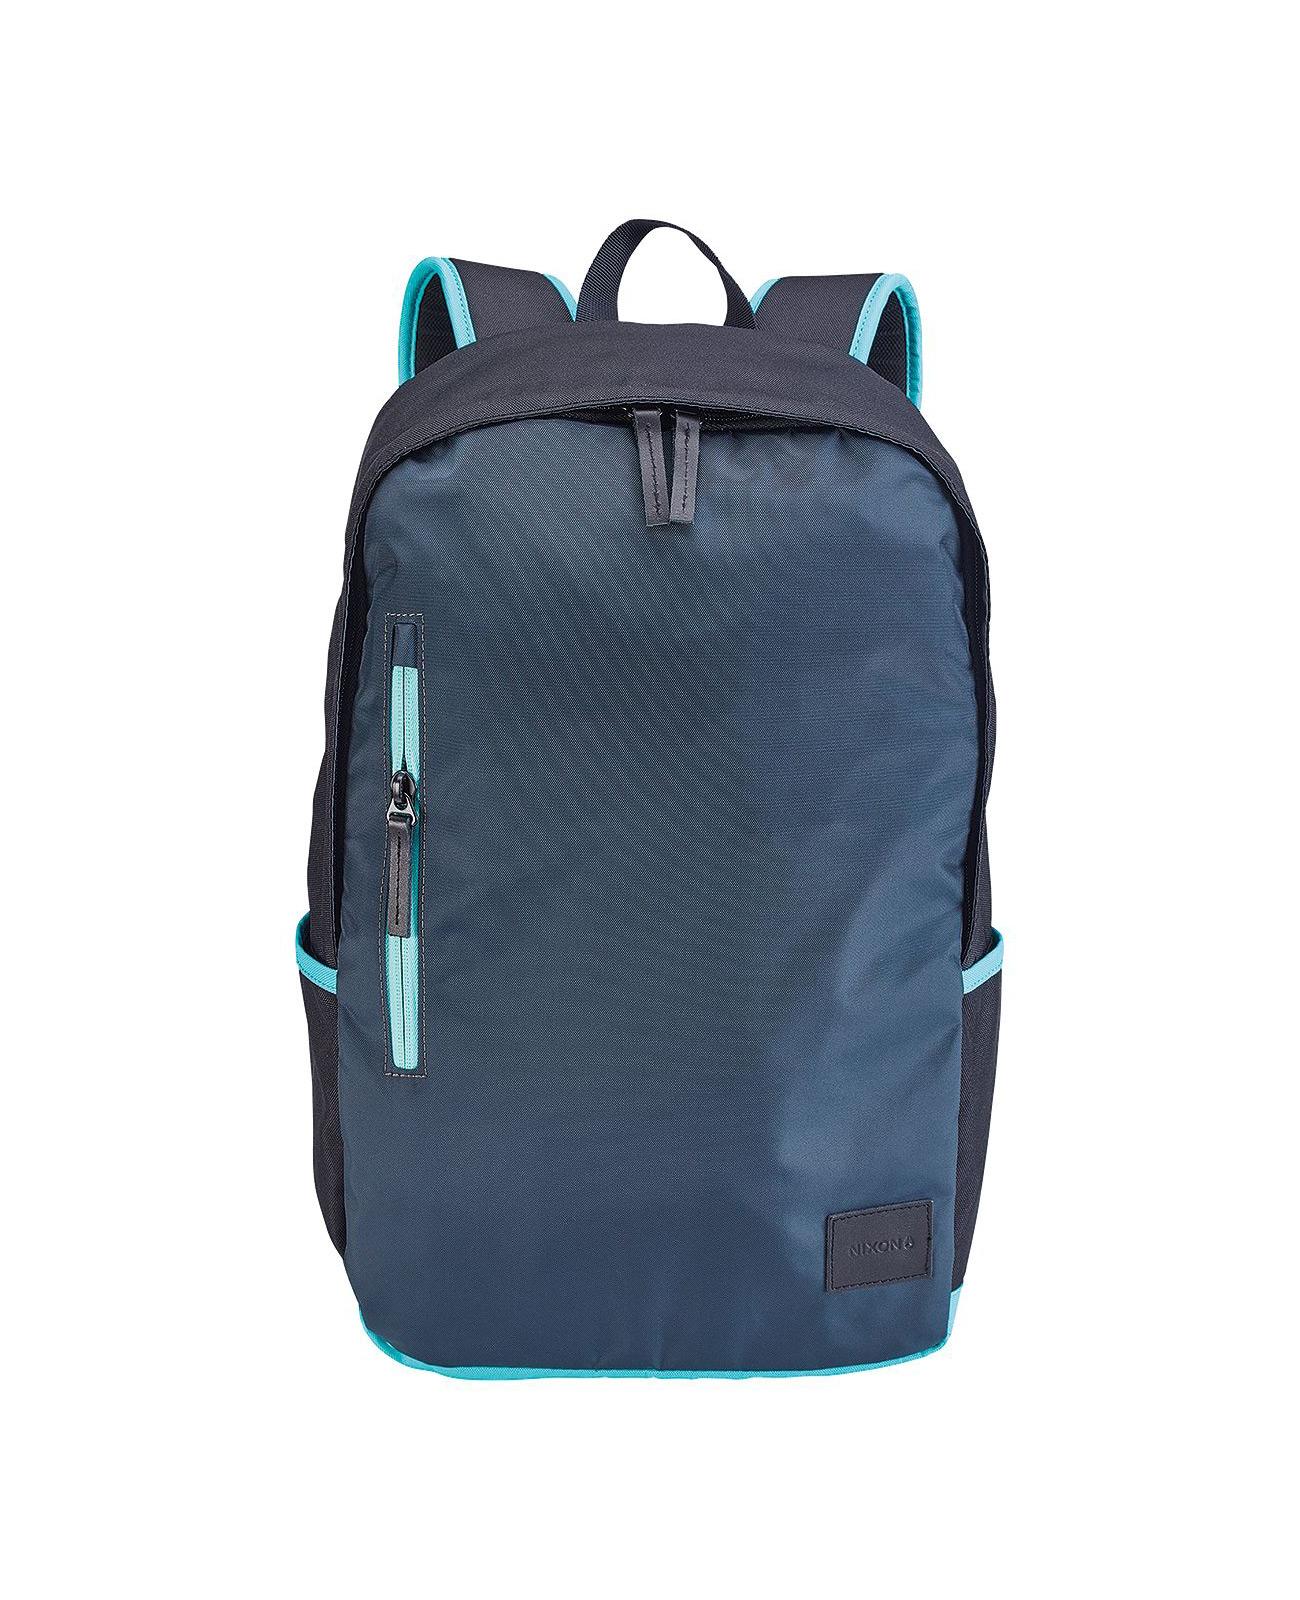 Smith Backpack SE